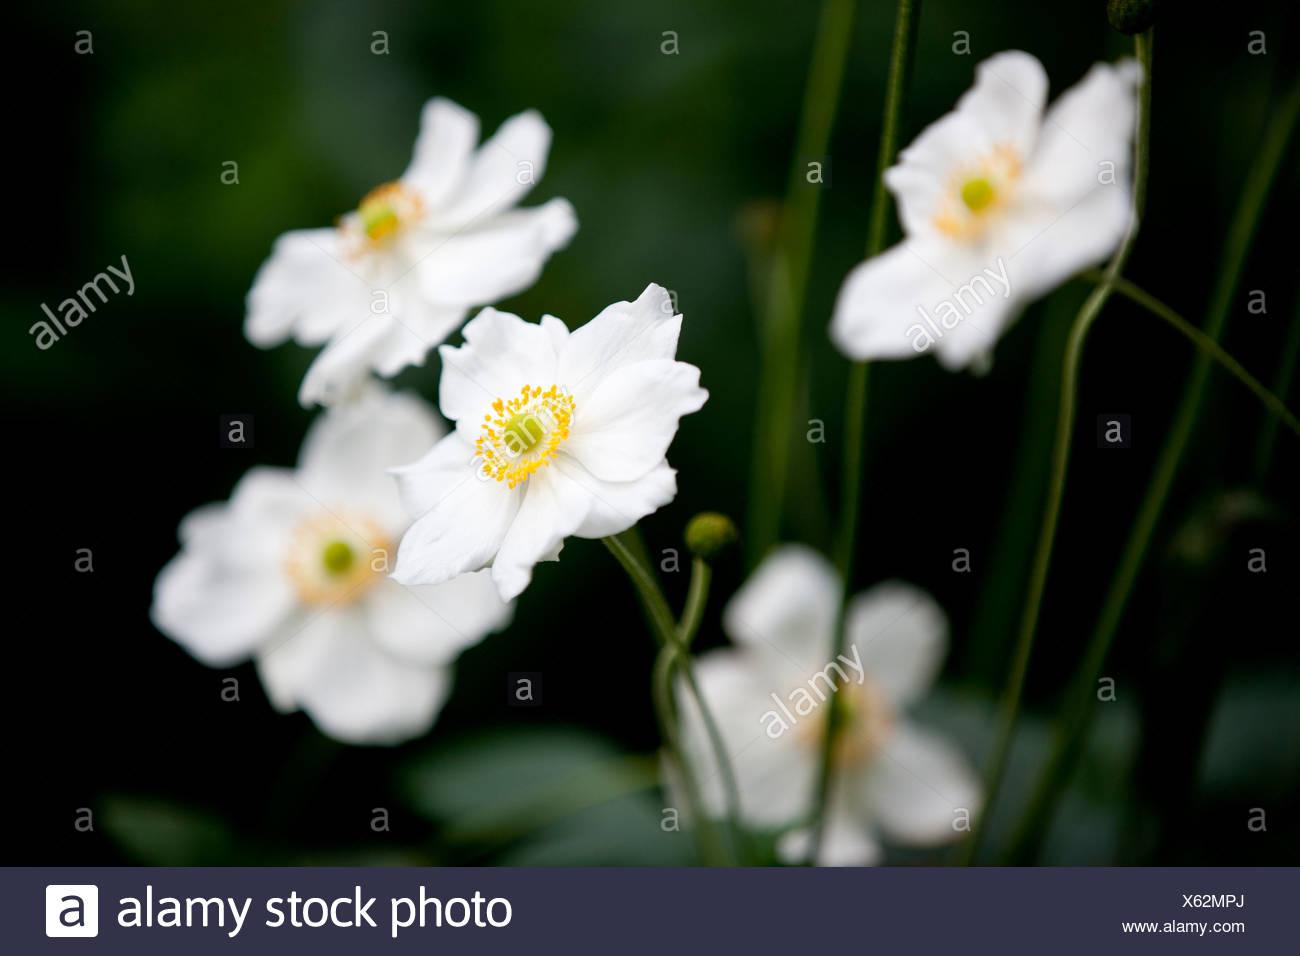 White Japanese Anemone Flowers Stock Photo 279114042 Alamy